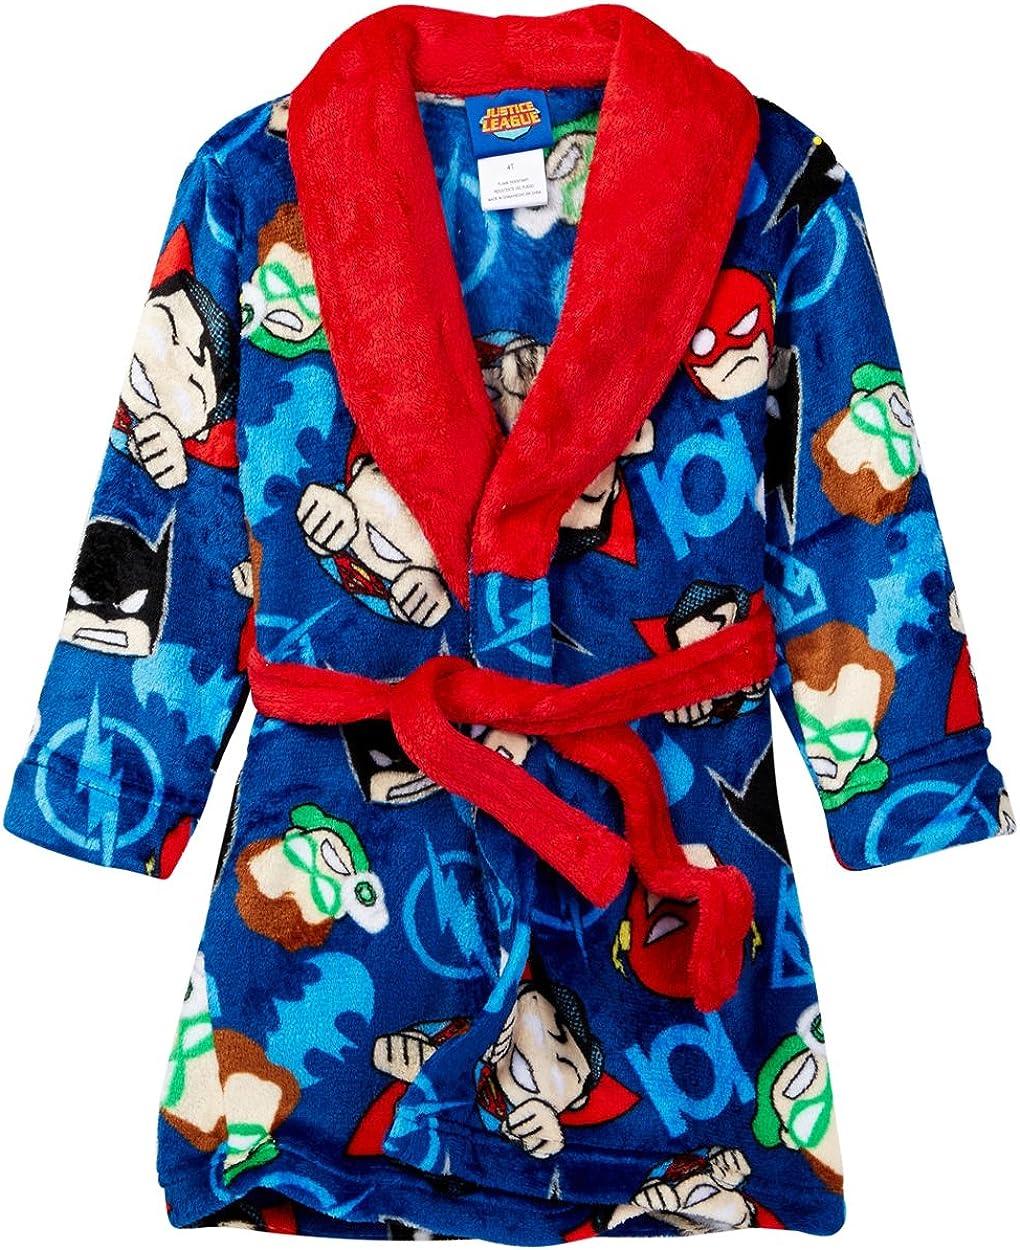 NEW Komar Kids Red Fleece Bathrobe for Boys with Pockets